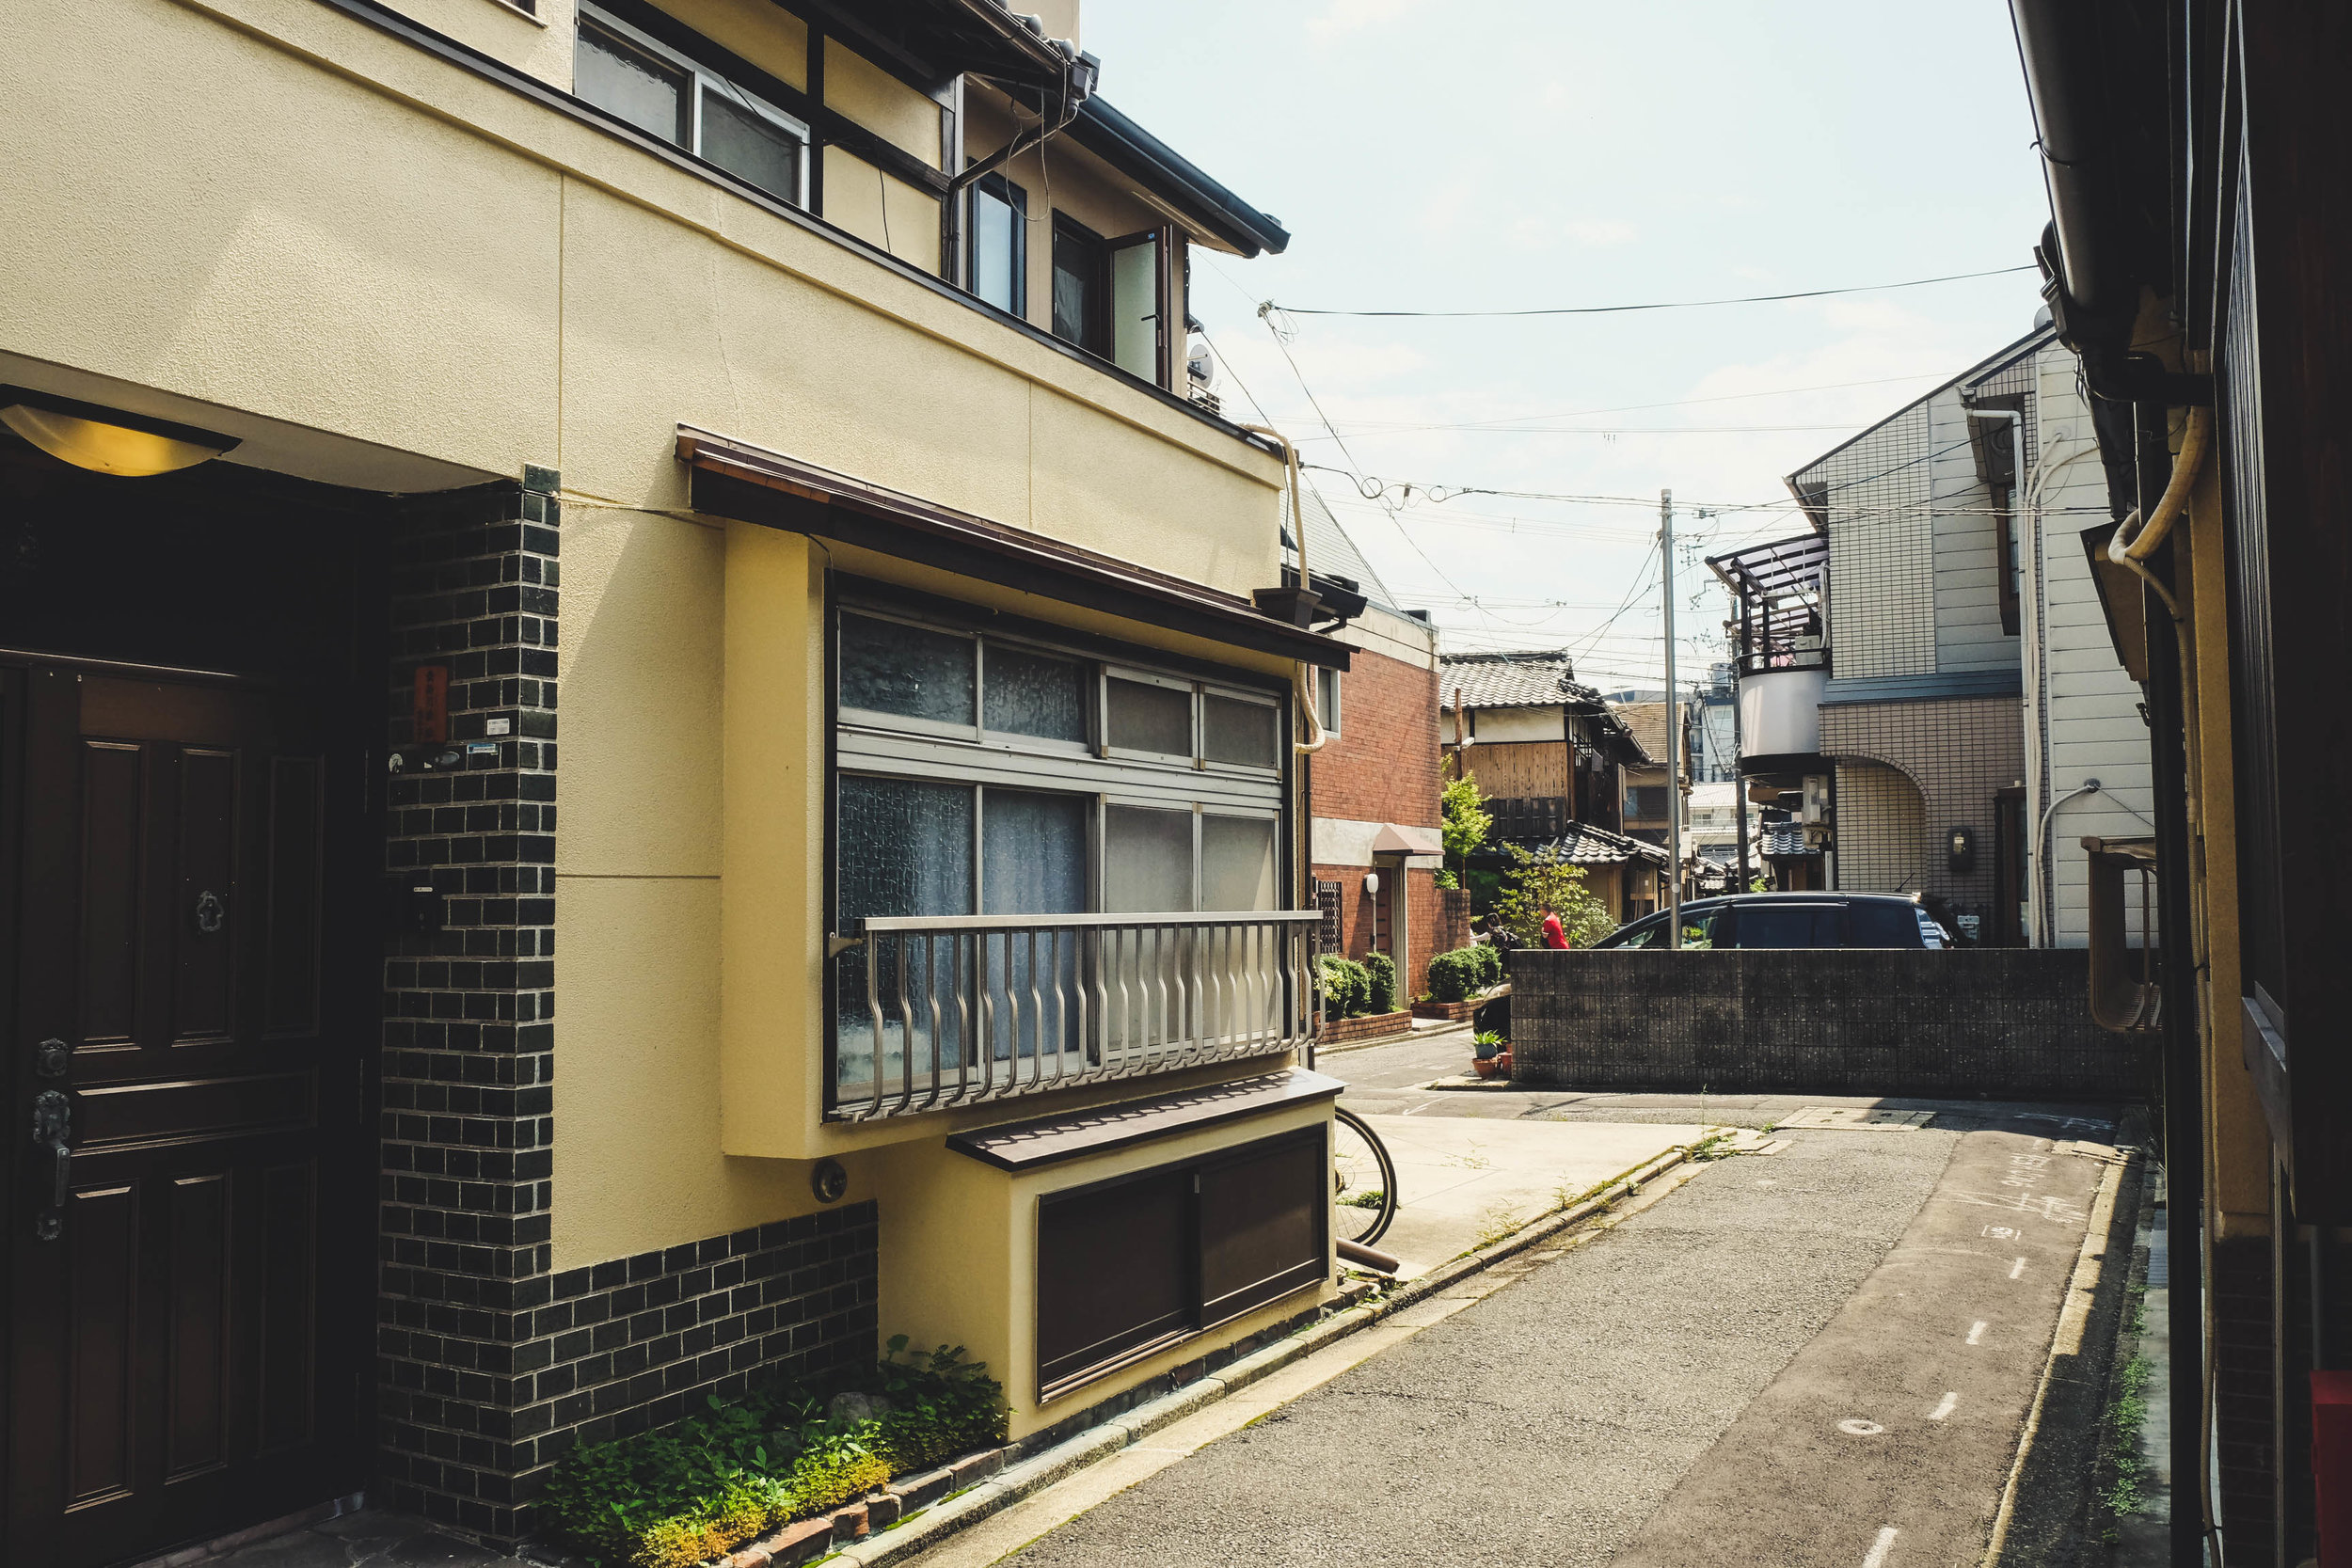 8.31.19_kyoto-52.jpg